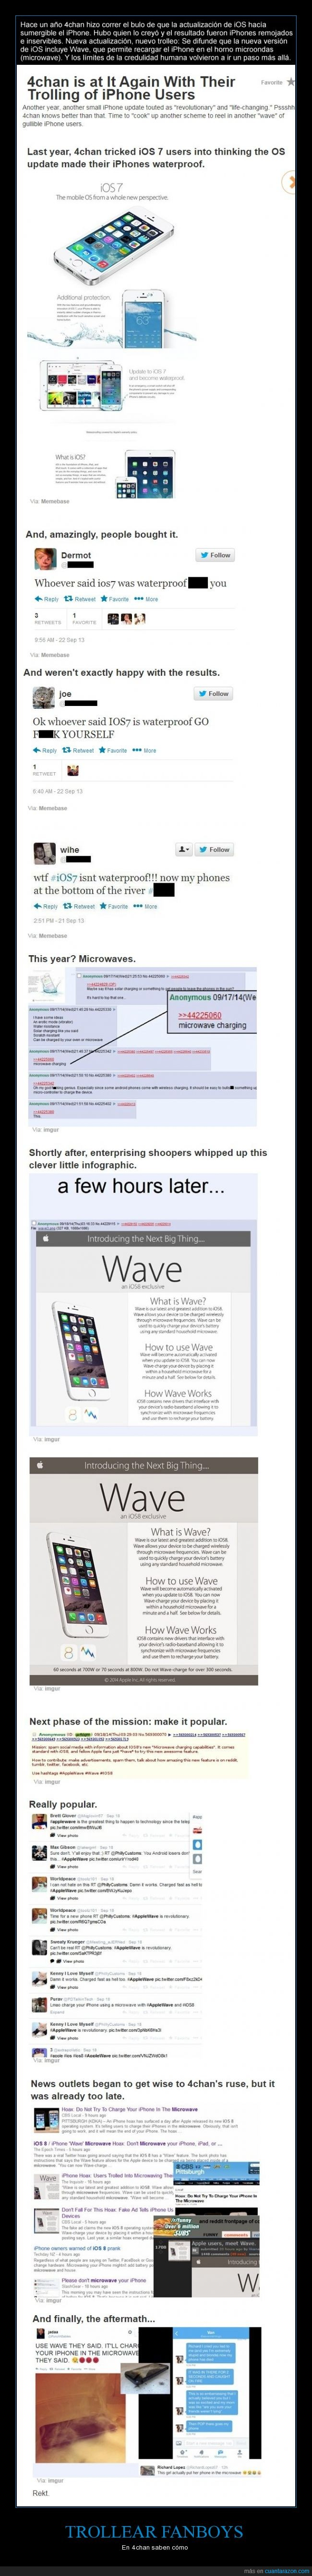 4chan,android ya lo tenia hace dos años,impermeable,iphone,metersela doblada,microondas,trollear